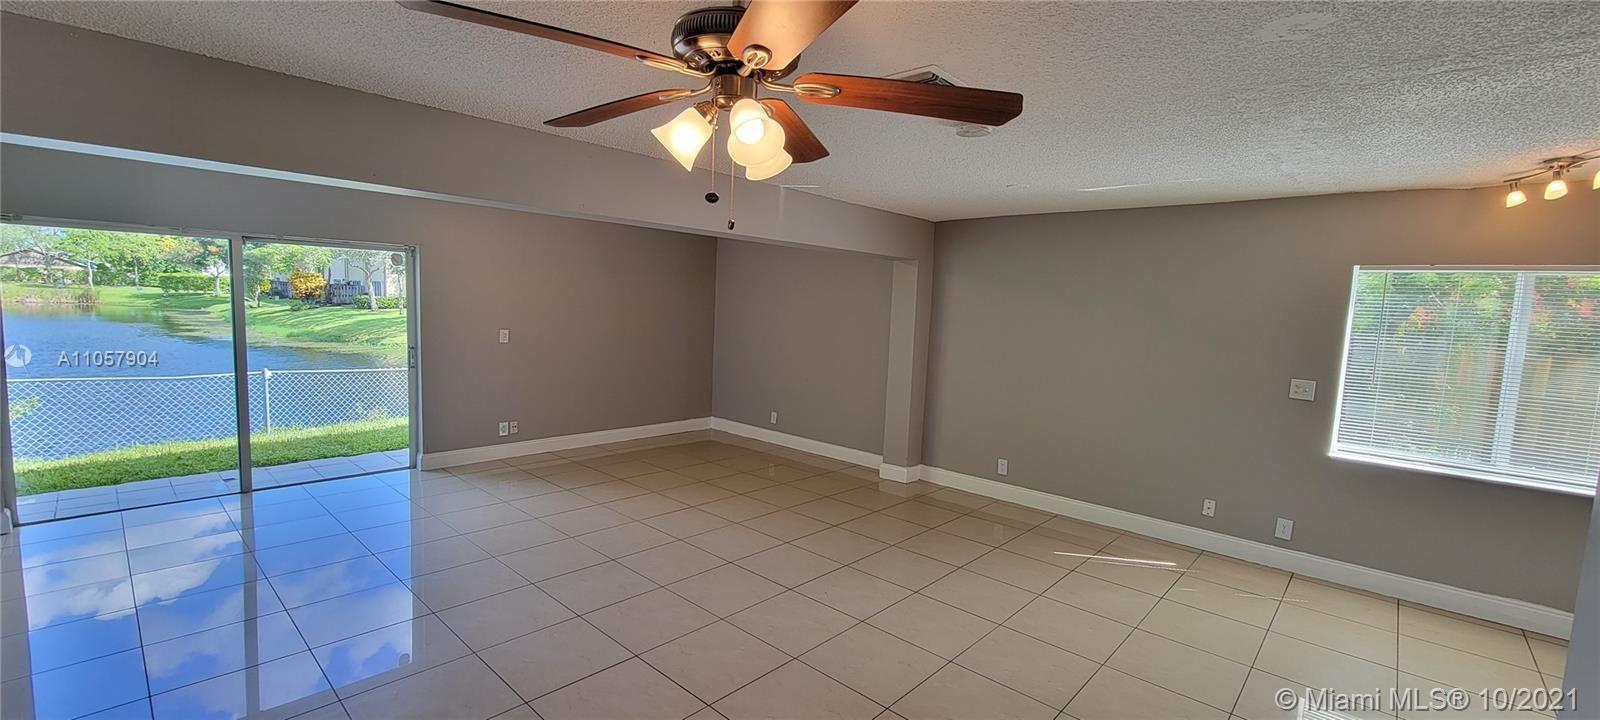 806 SW 75th Way, North Lauderdale, FL 33068 - #: A11057904